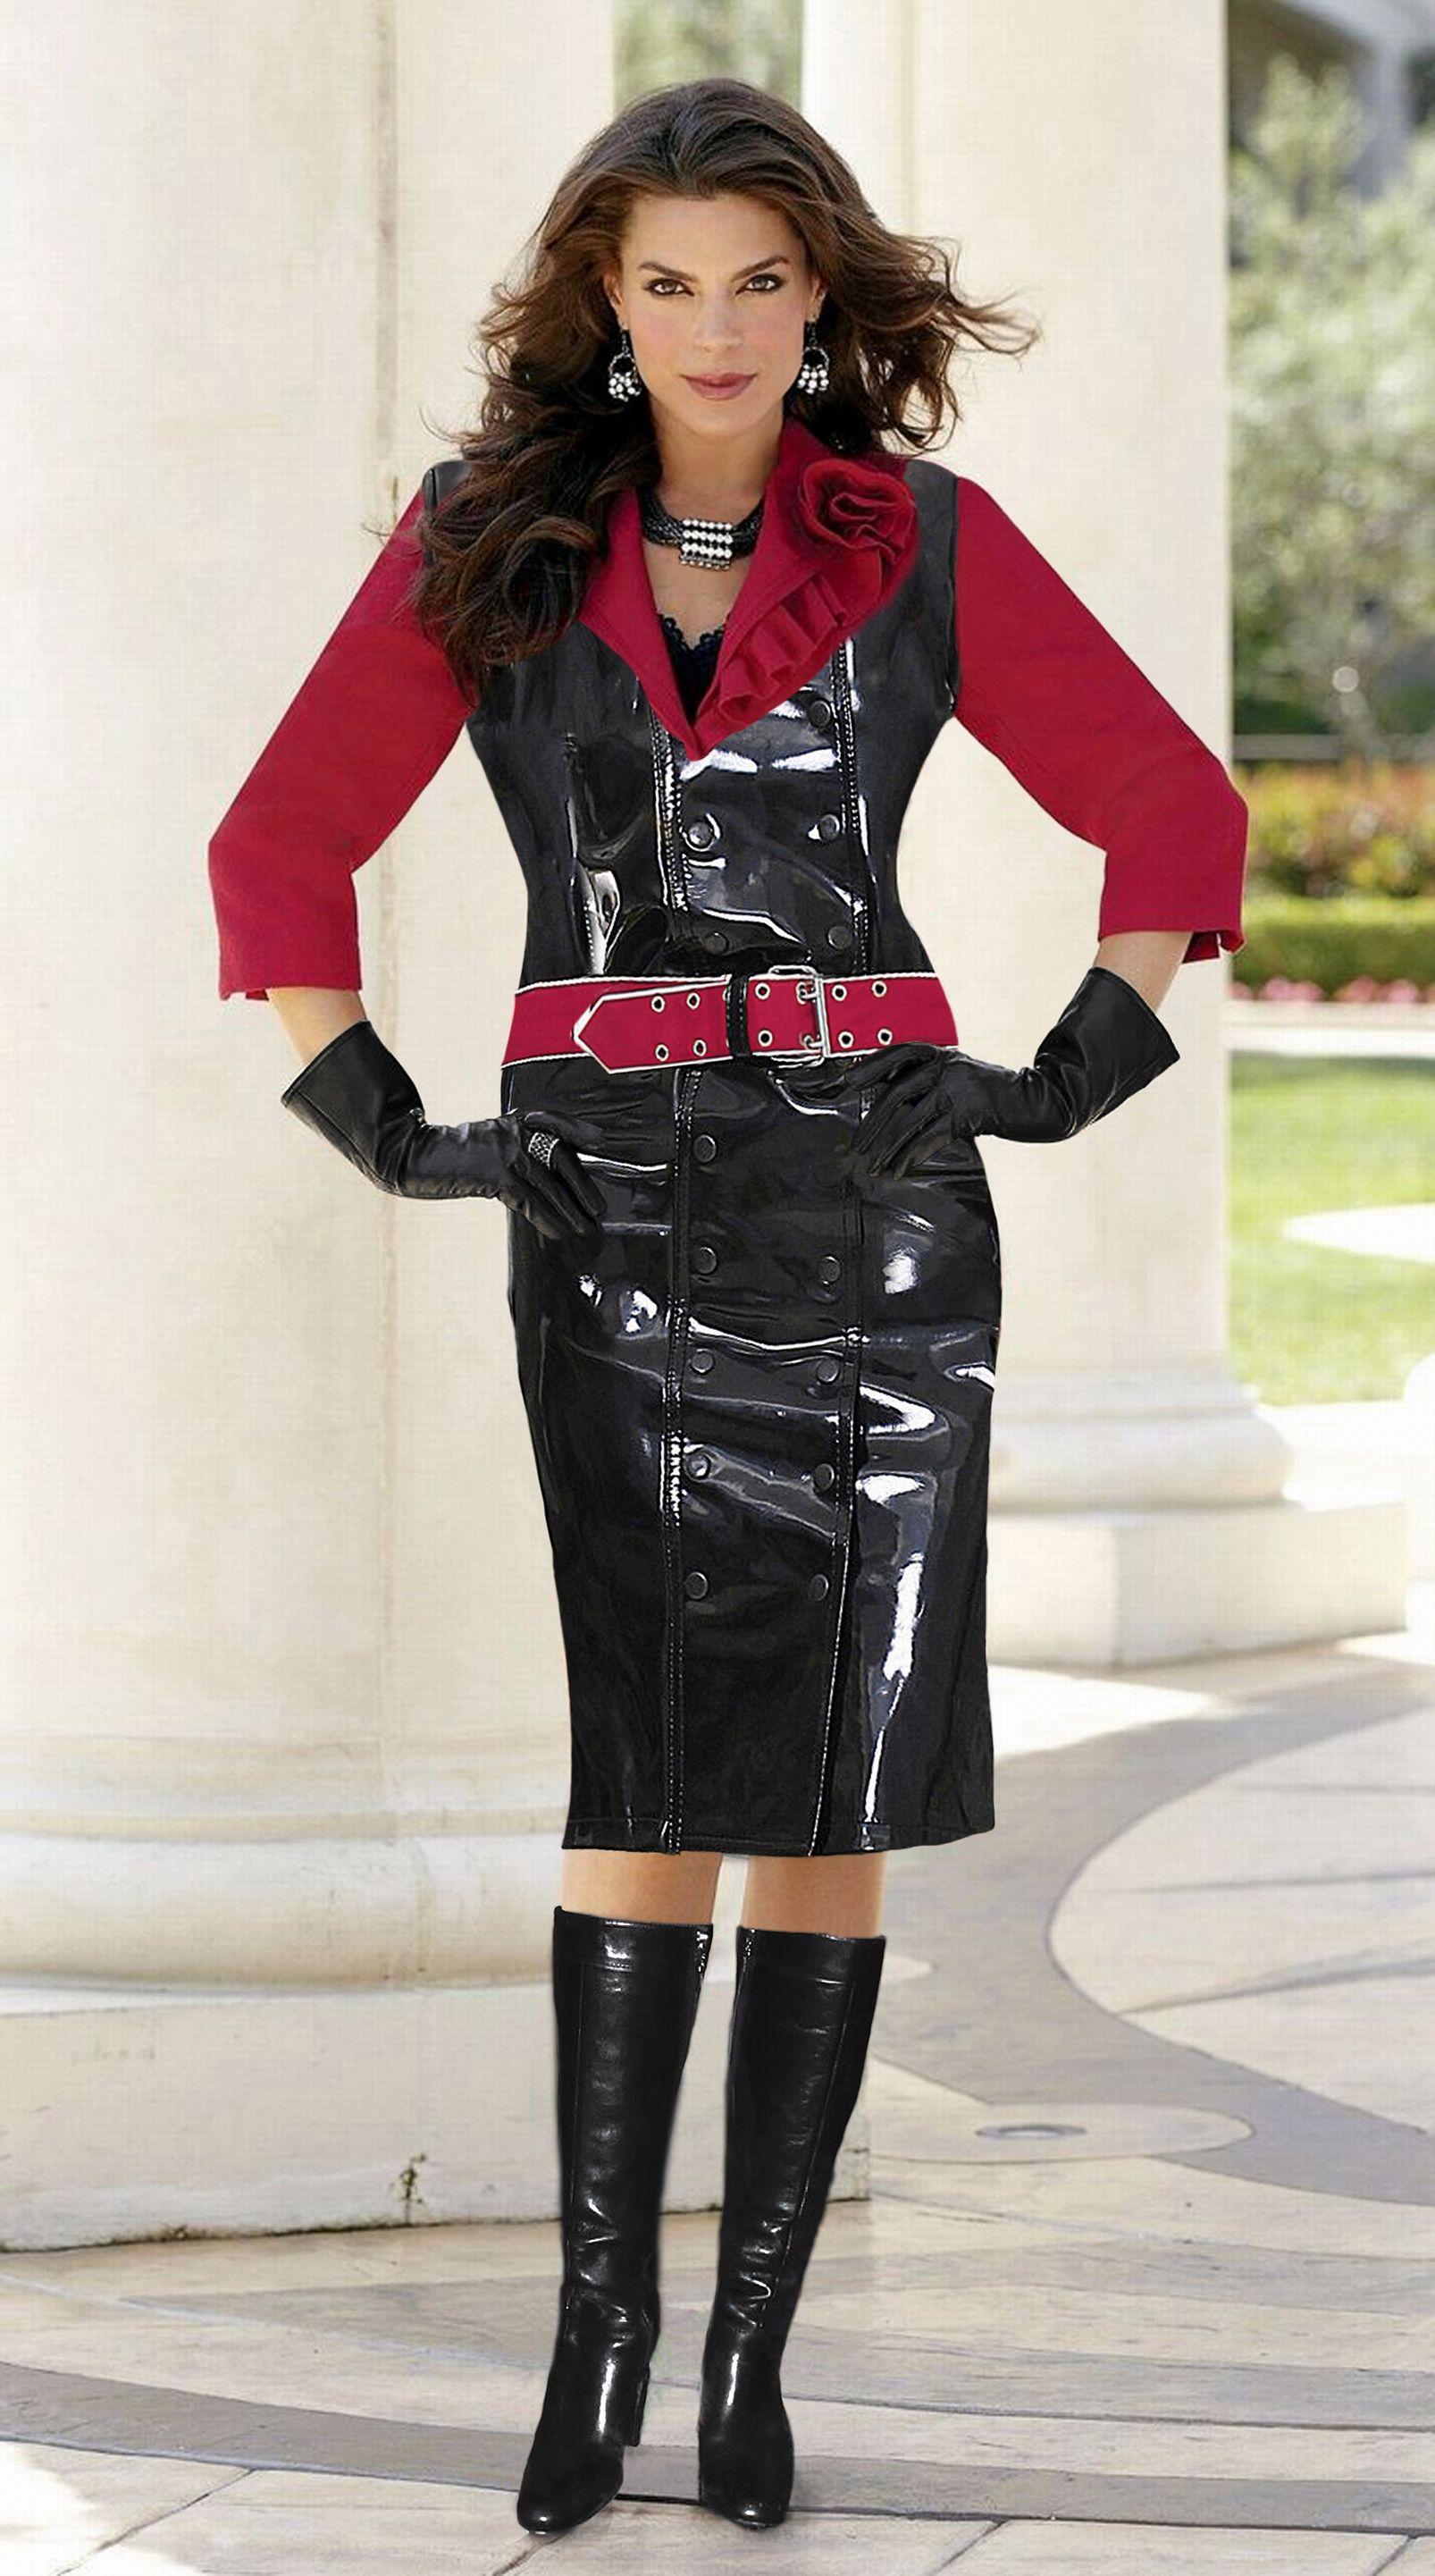 Brunette mistress win leather costume